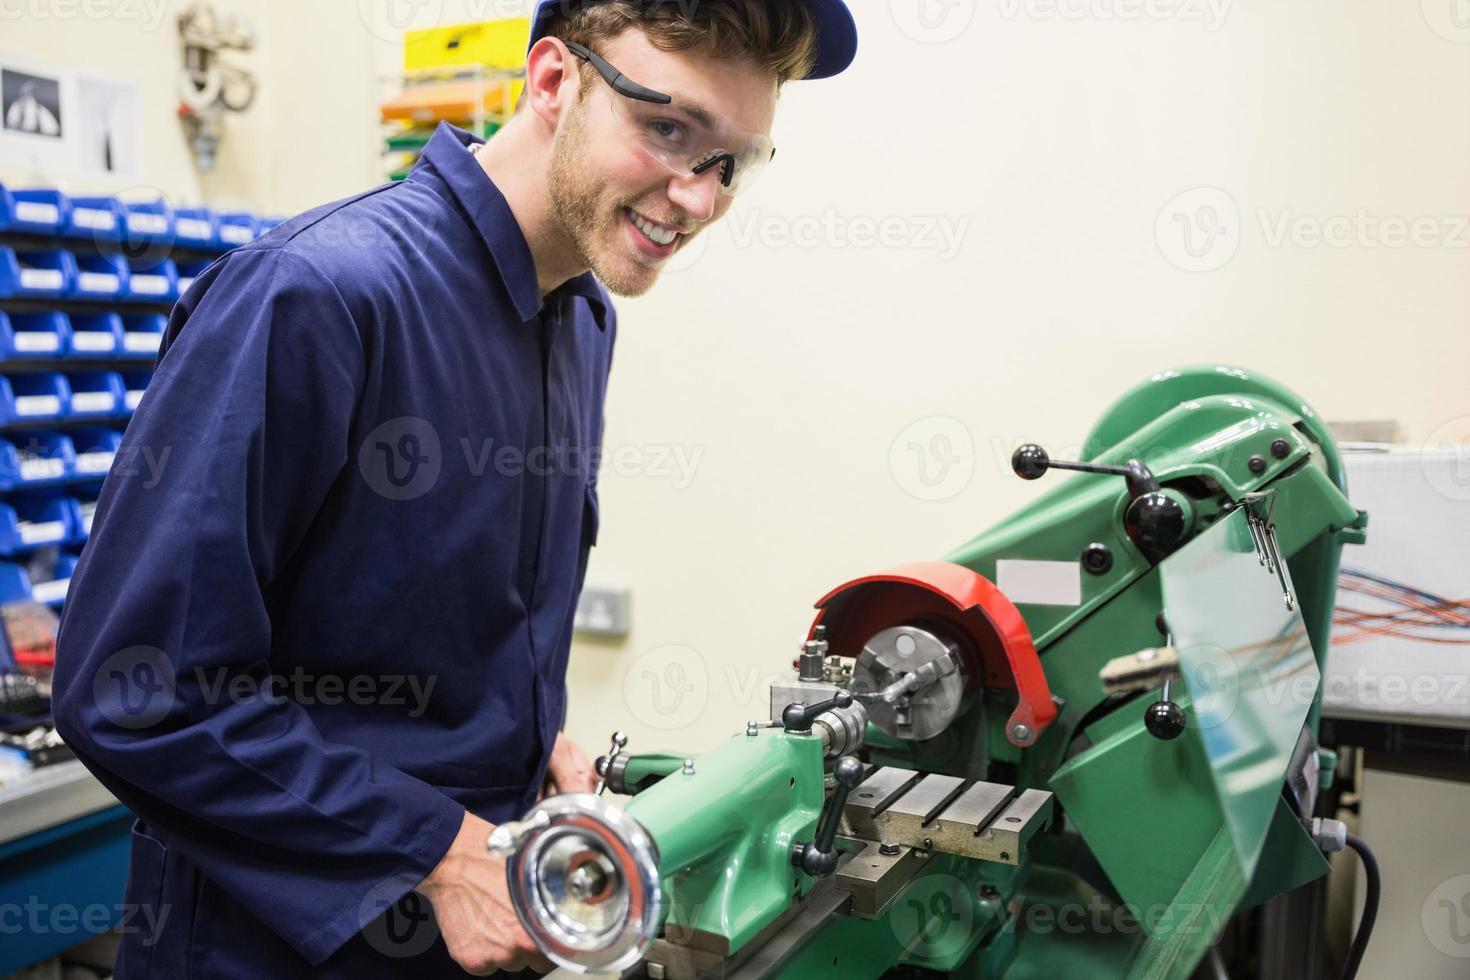 studente di ingegneria che utilizza macchinari pesanti foto